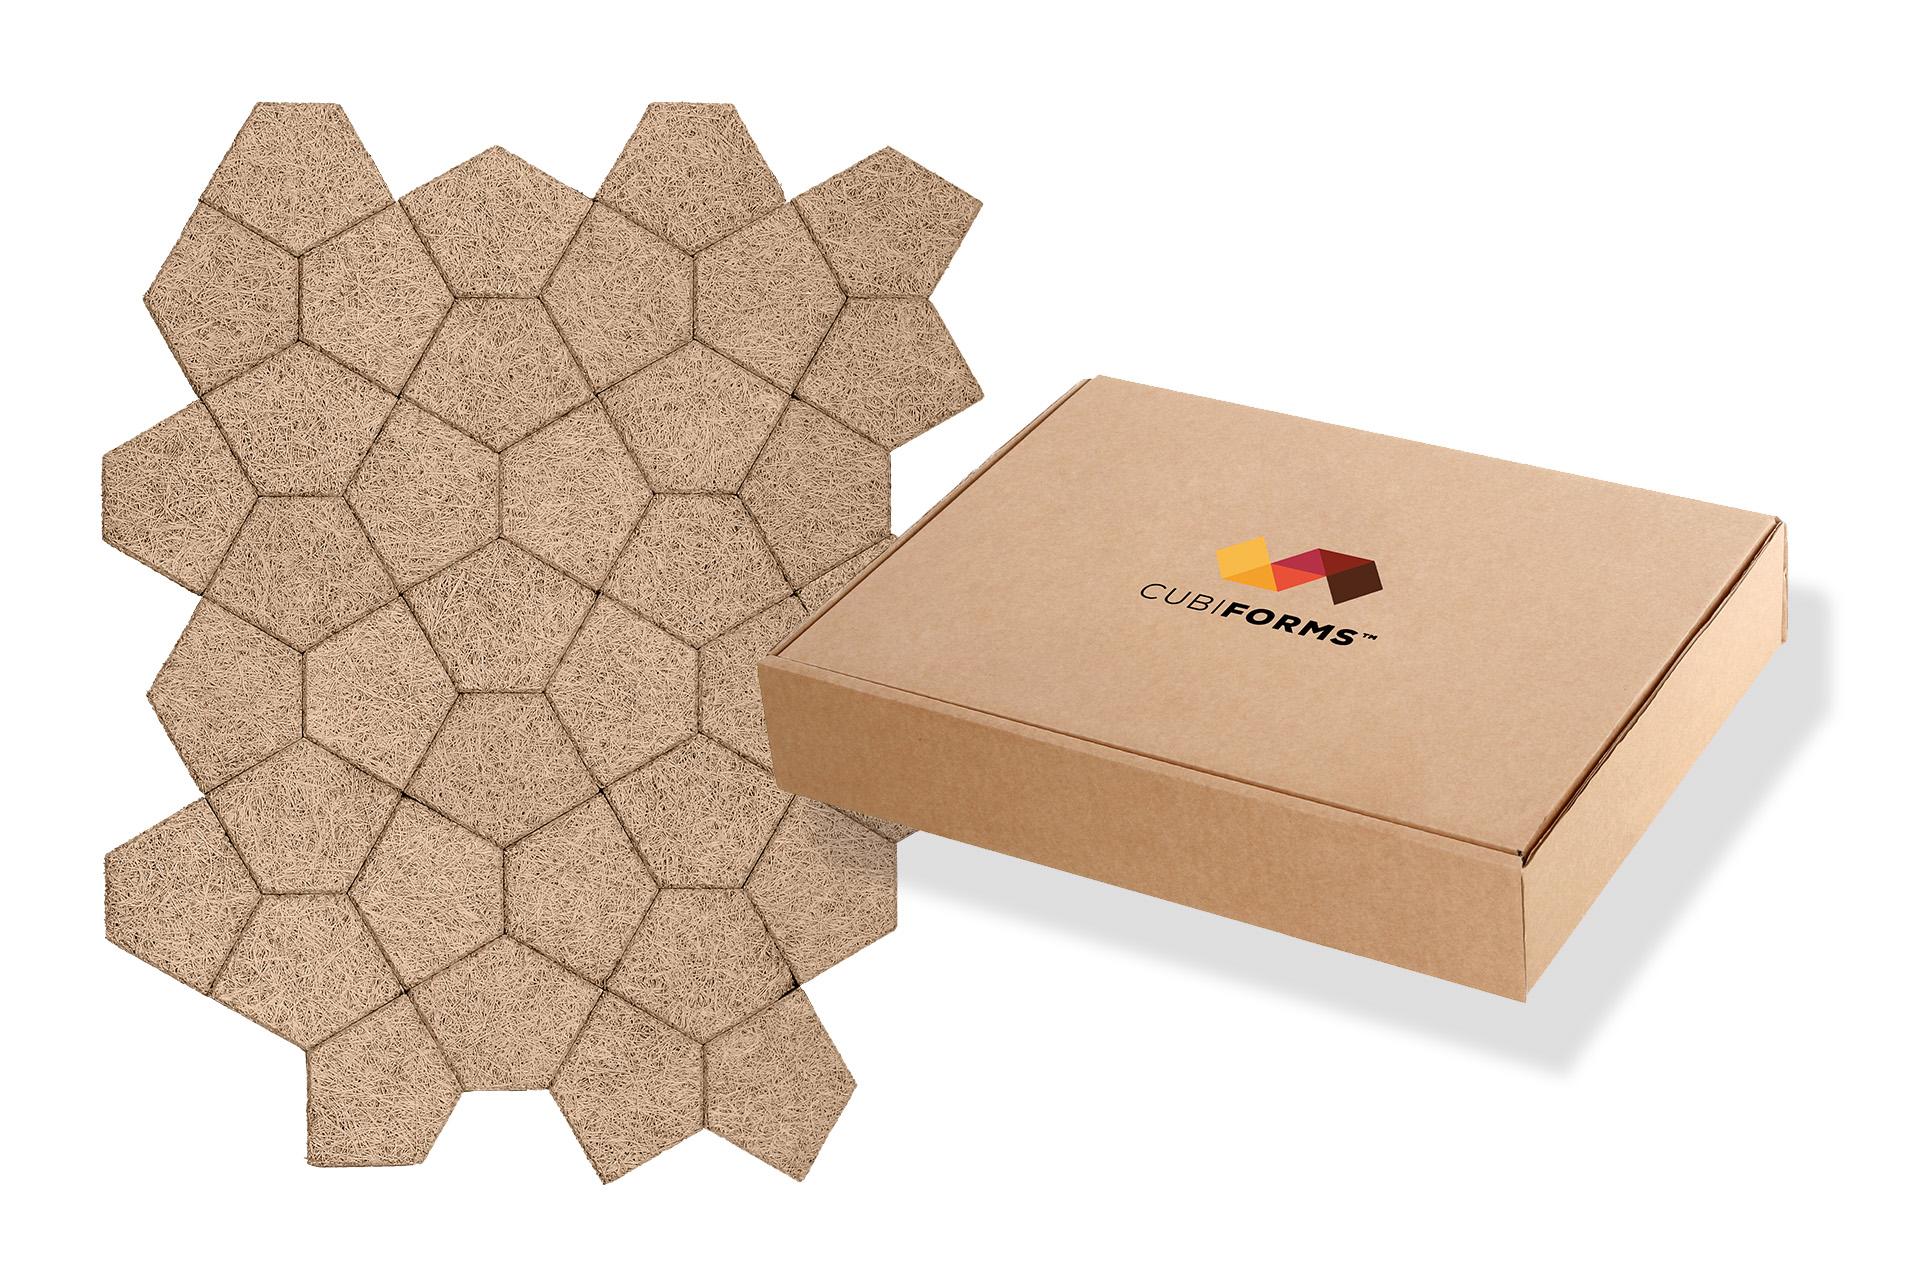 CubiForms Logo Packaging Design